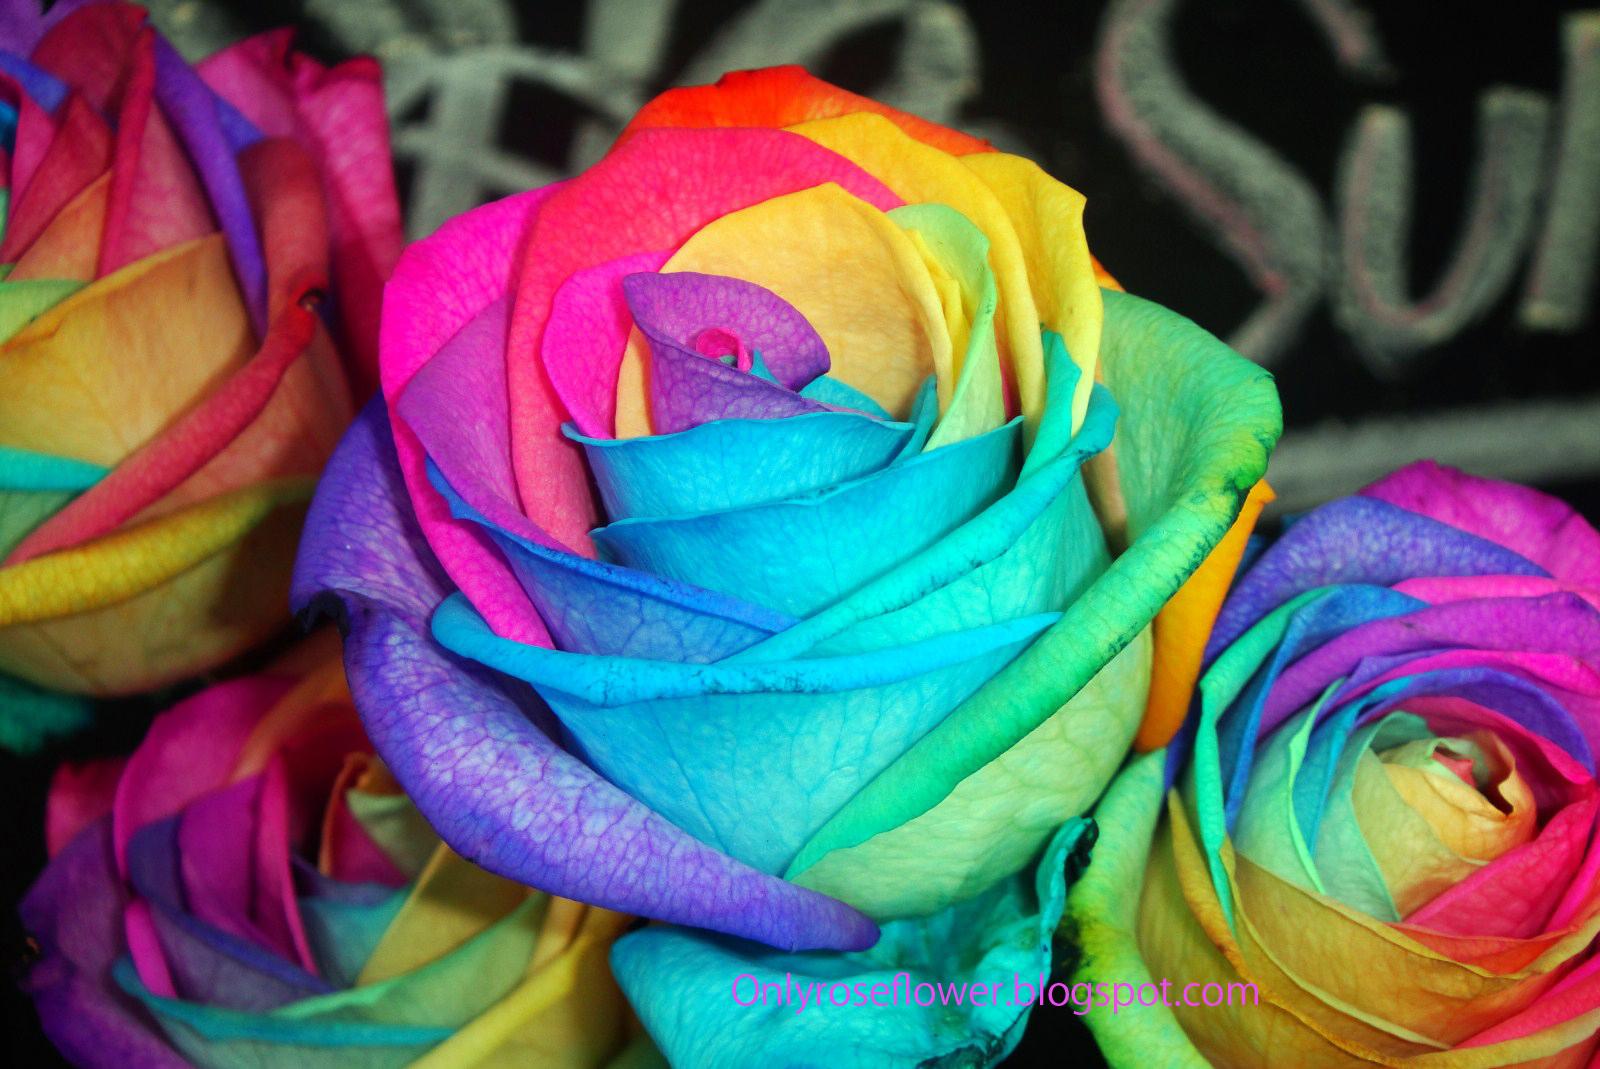 http://1.bp.blogspot.com/_b-YuSdvMmaQ/TMSKUkWn1FI/AAAAAAAAIUQ/3OlyDAPkVkQ/s1600/DSC07804.jpg#multicolor%20roses%201600x1069